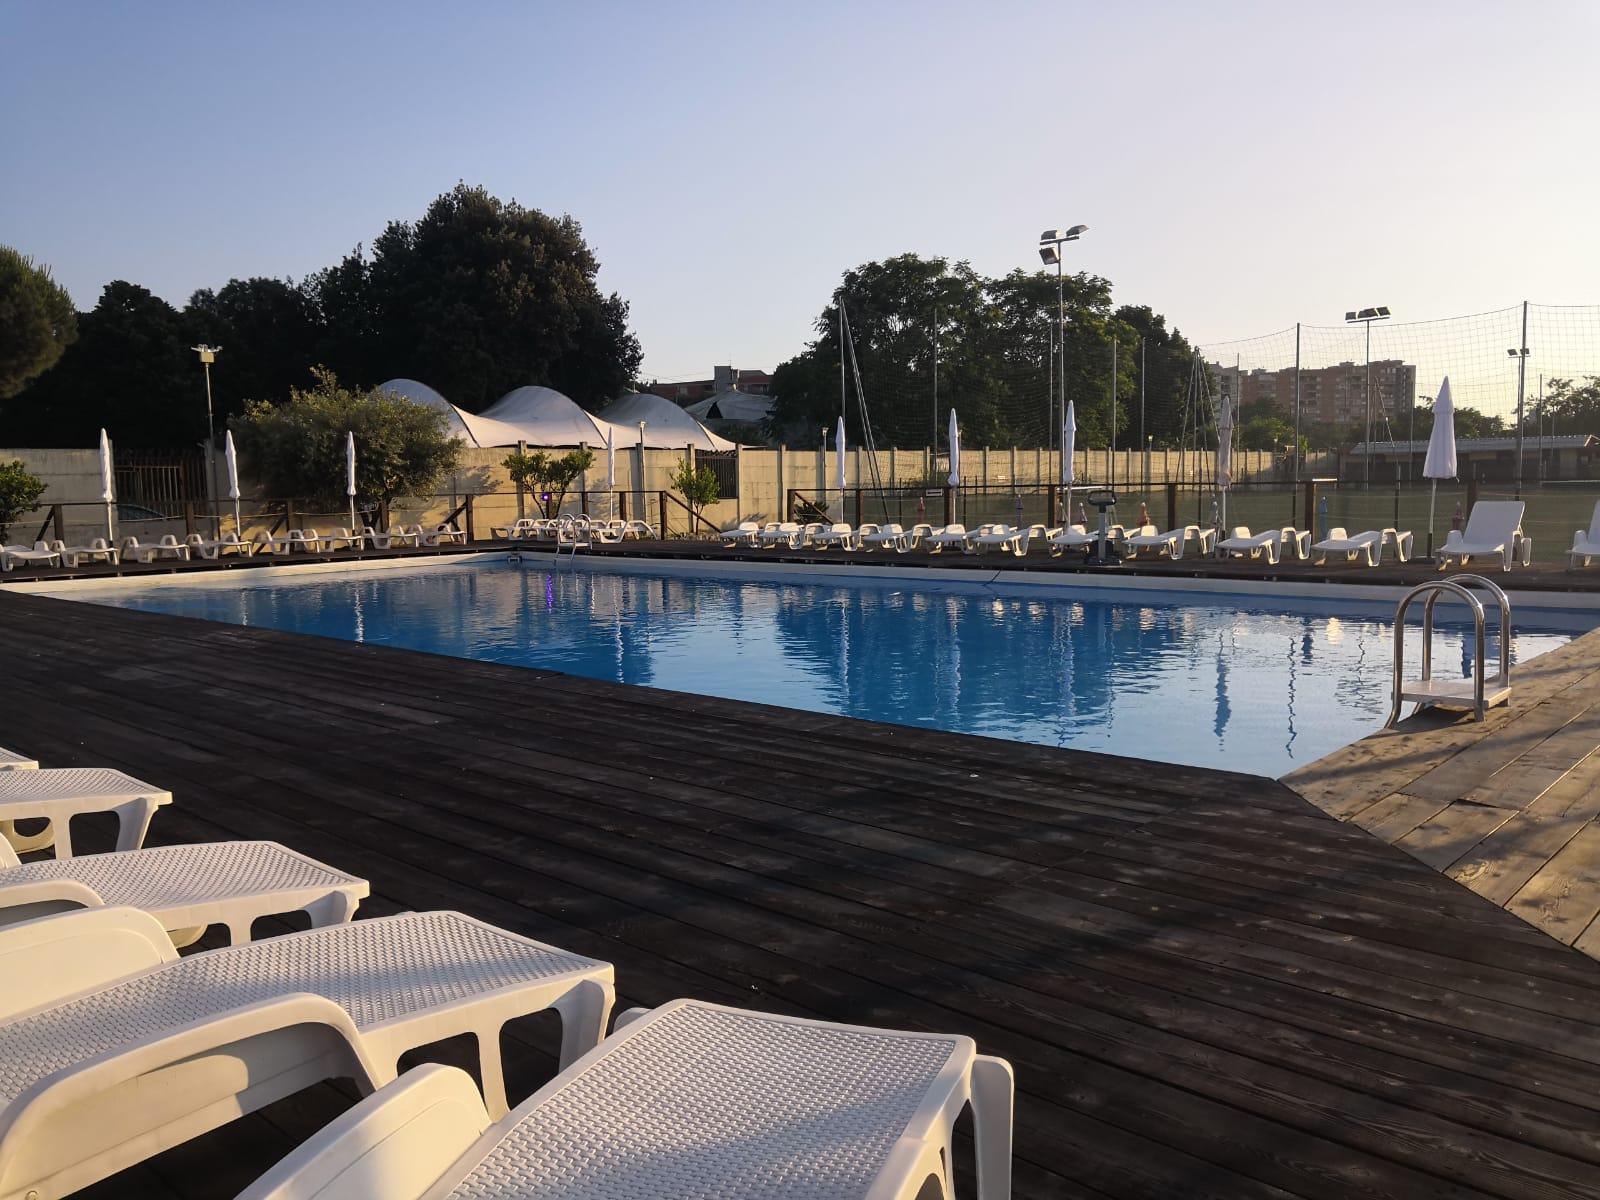 centocellefc piscina 2019 - 12